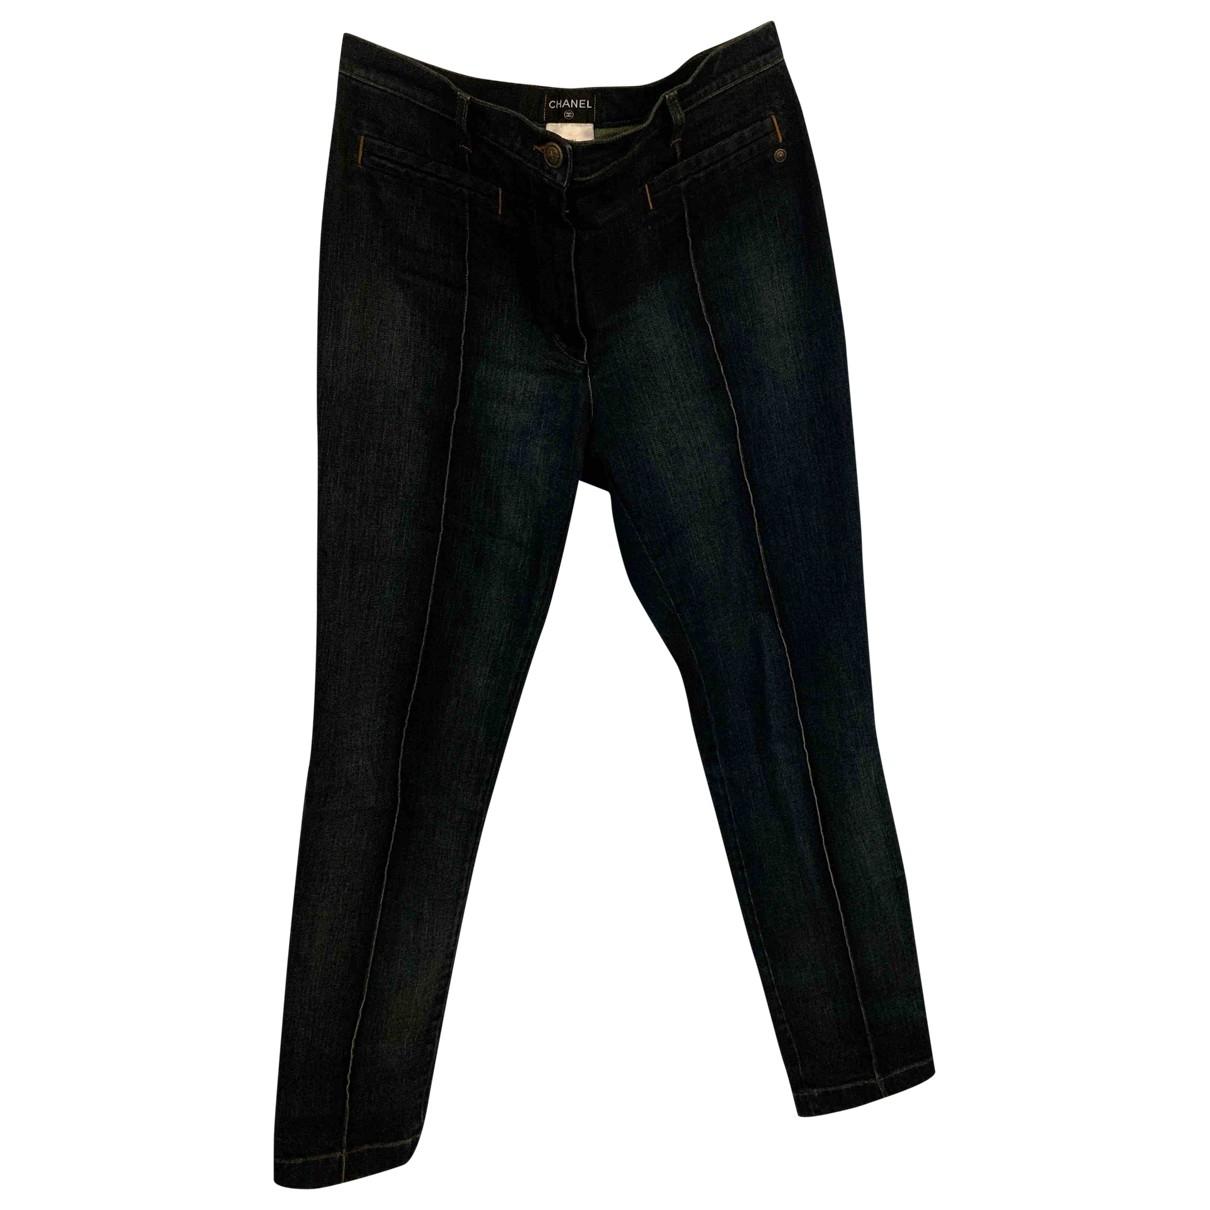 Chanel \N Jeans in  Blau Baumwolle